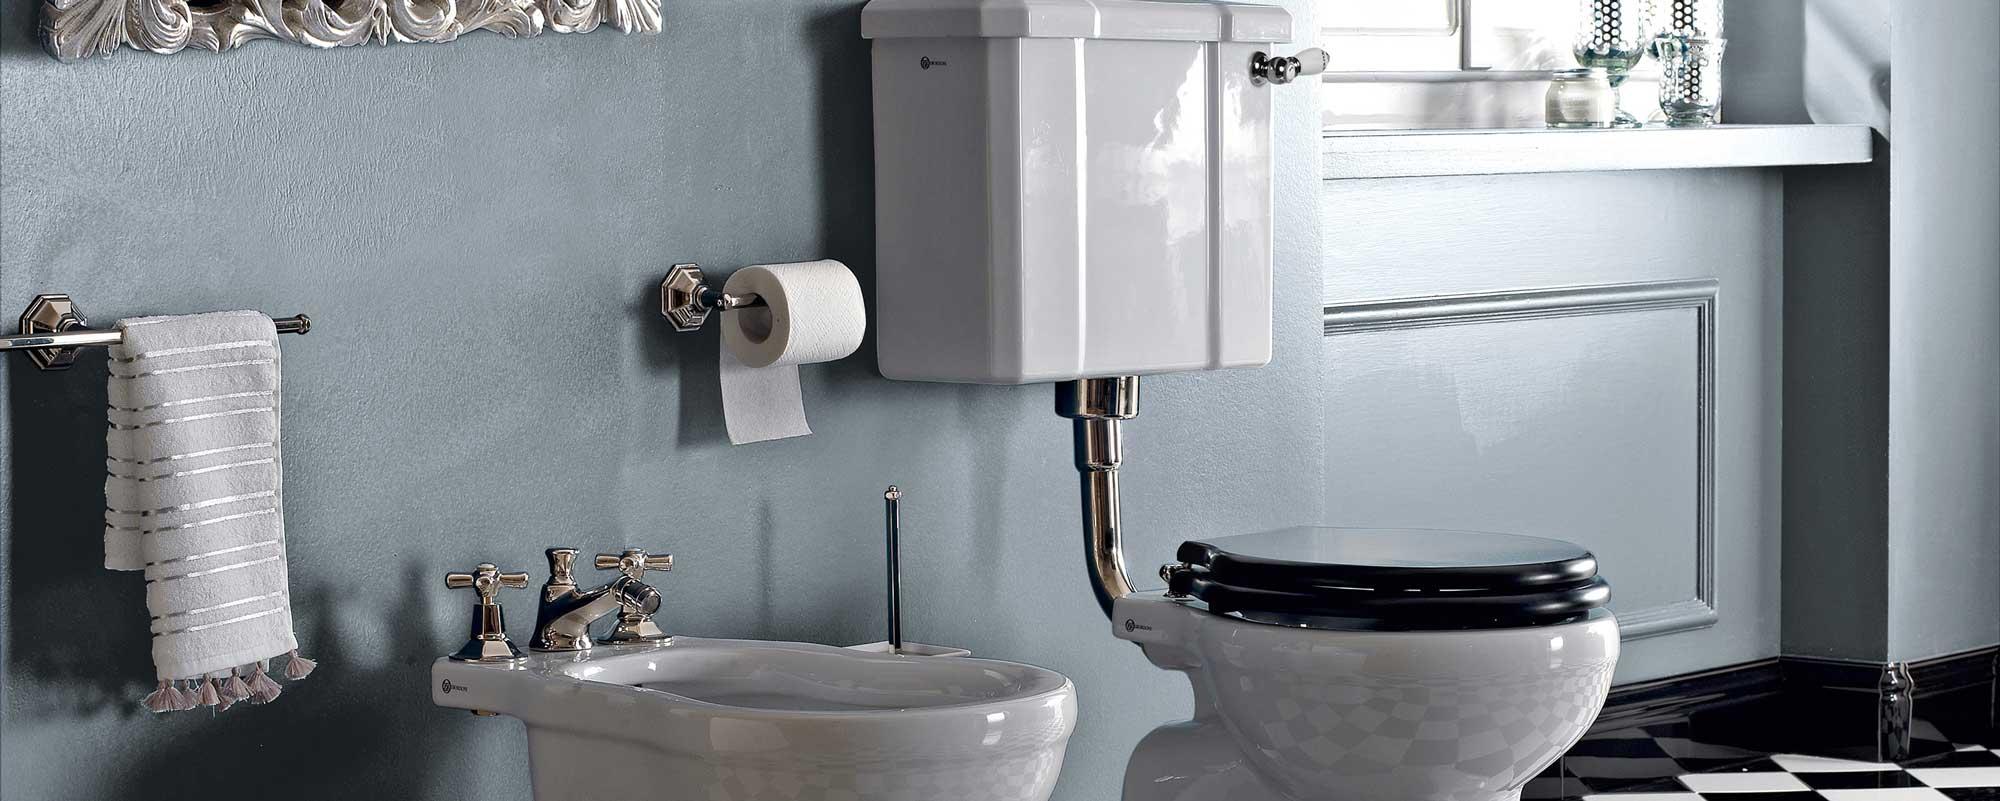 Sbordoni Sanitaryware from Thomas Crapper & Co in the UK